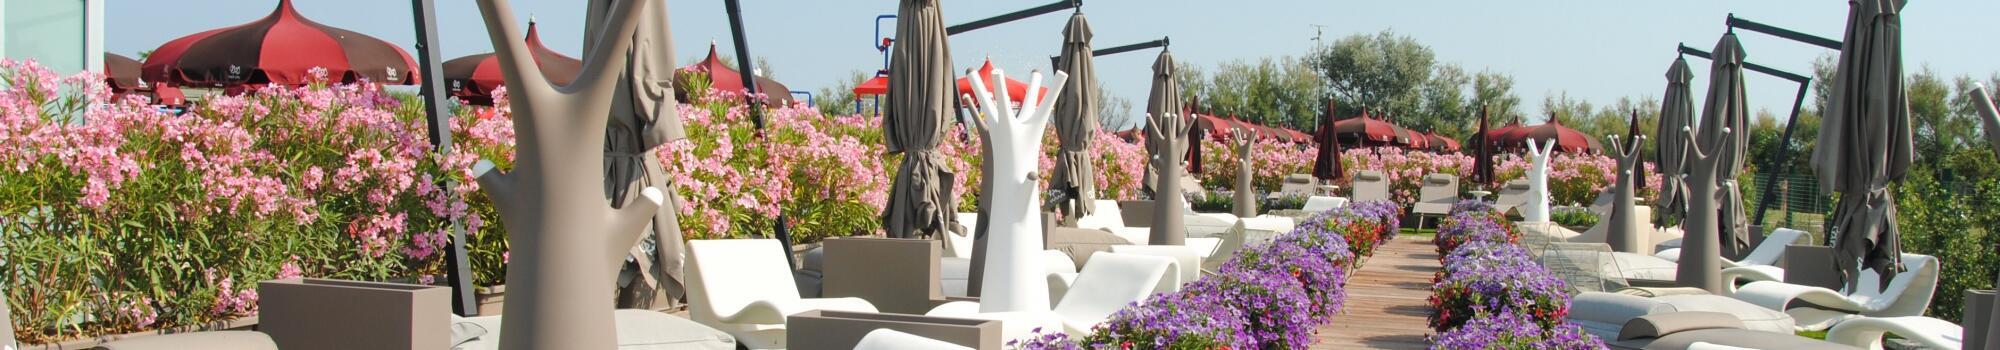 POOL COMFORT AREA – Wasserpark